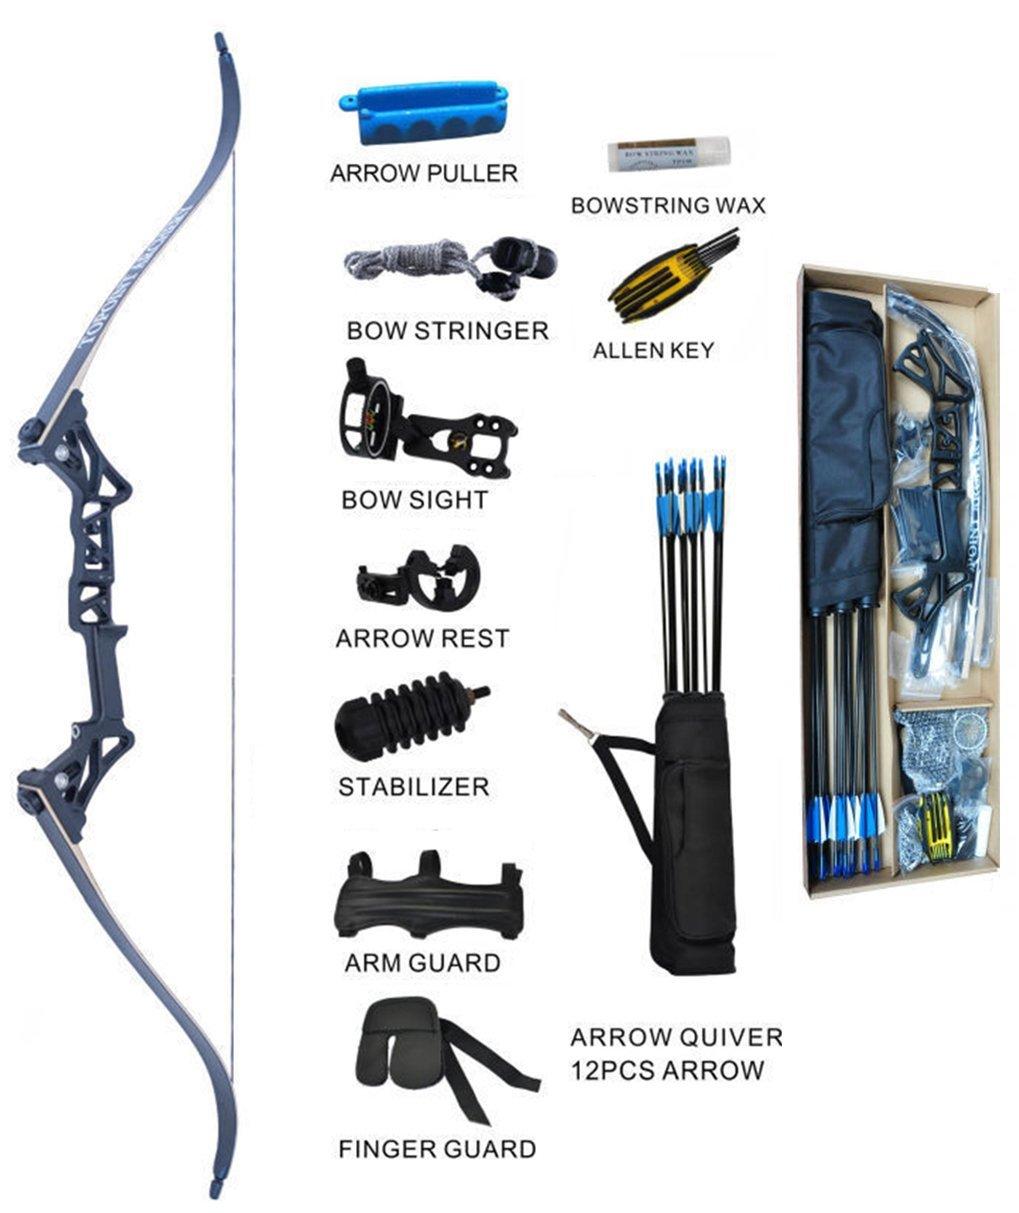 Bow & Arrow Sharrow Compound Bow Accessories 1 Set Compound Bow Sight Kits Arrow Rest Stabilizer For Compound Bow